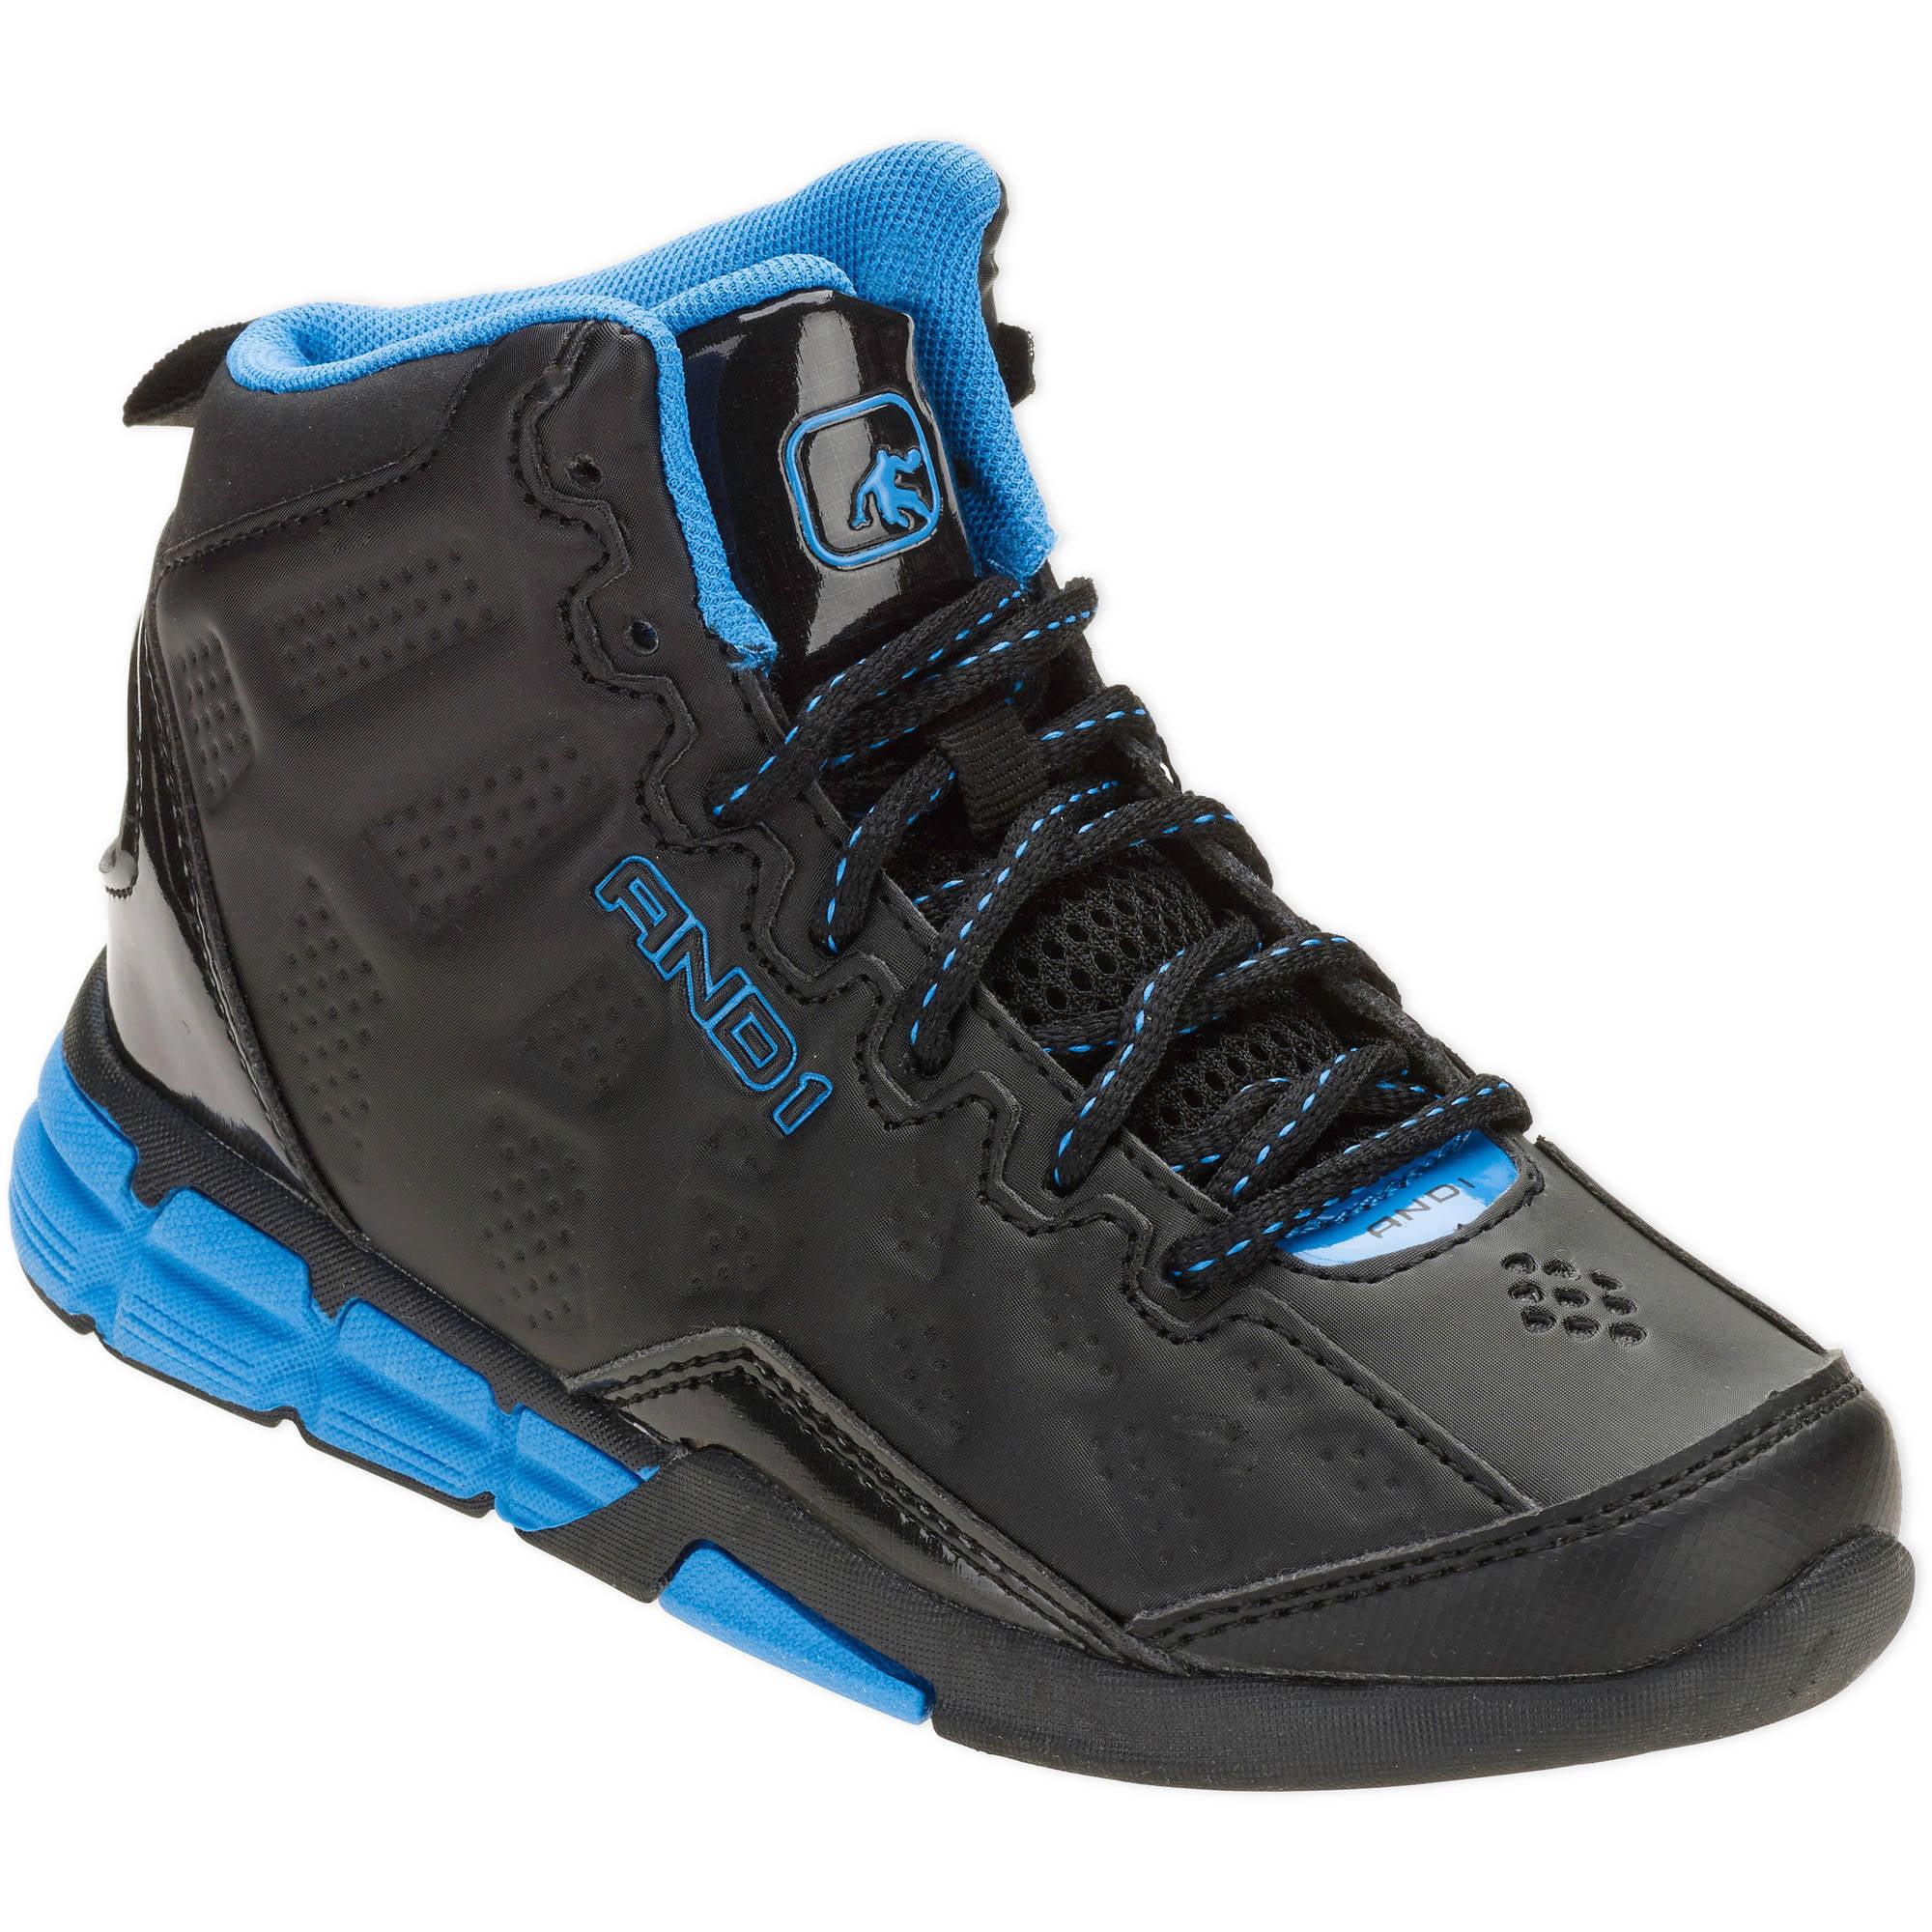 Shaq Boys' Retro Basketball Shoe - Walmart.com